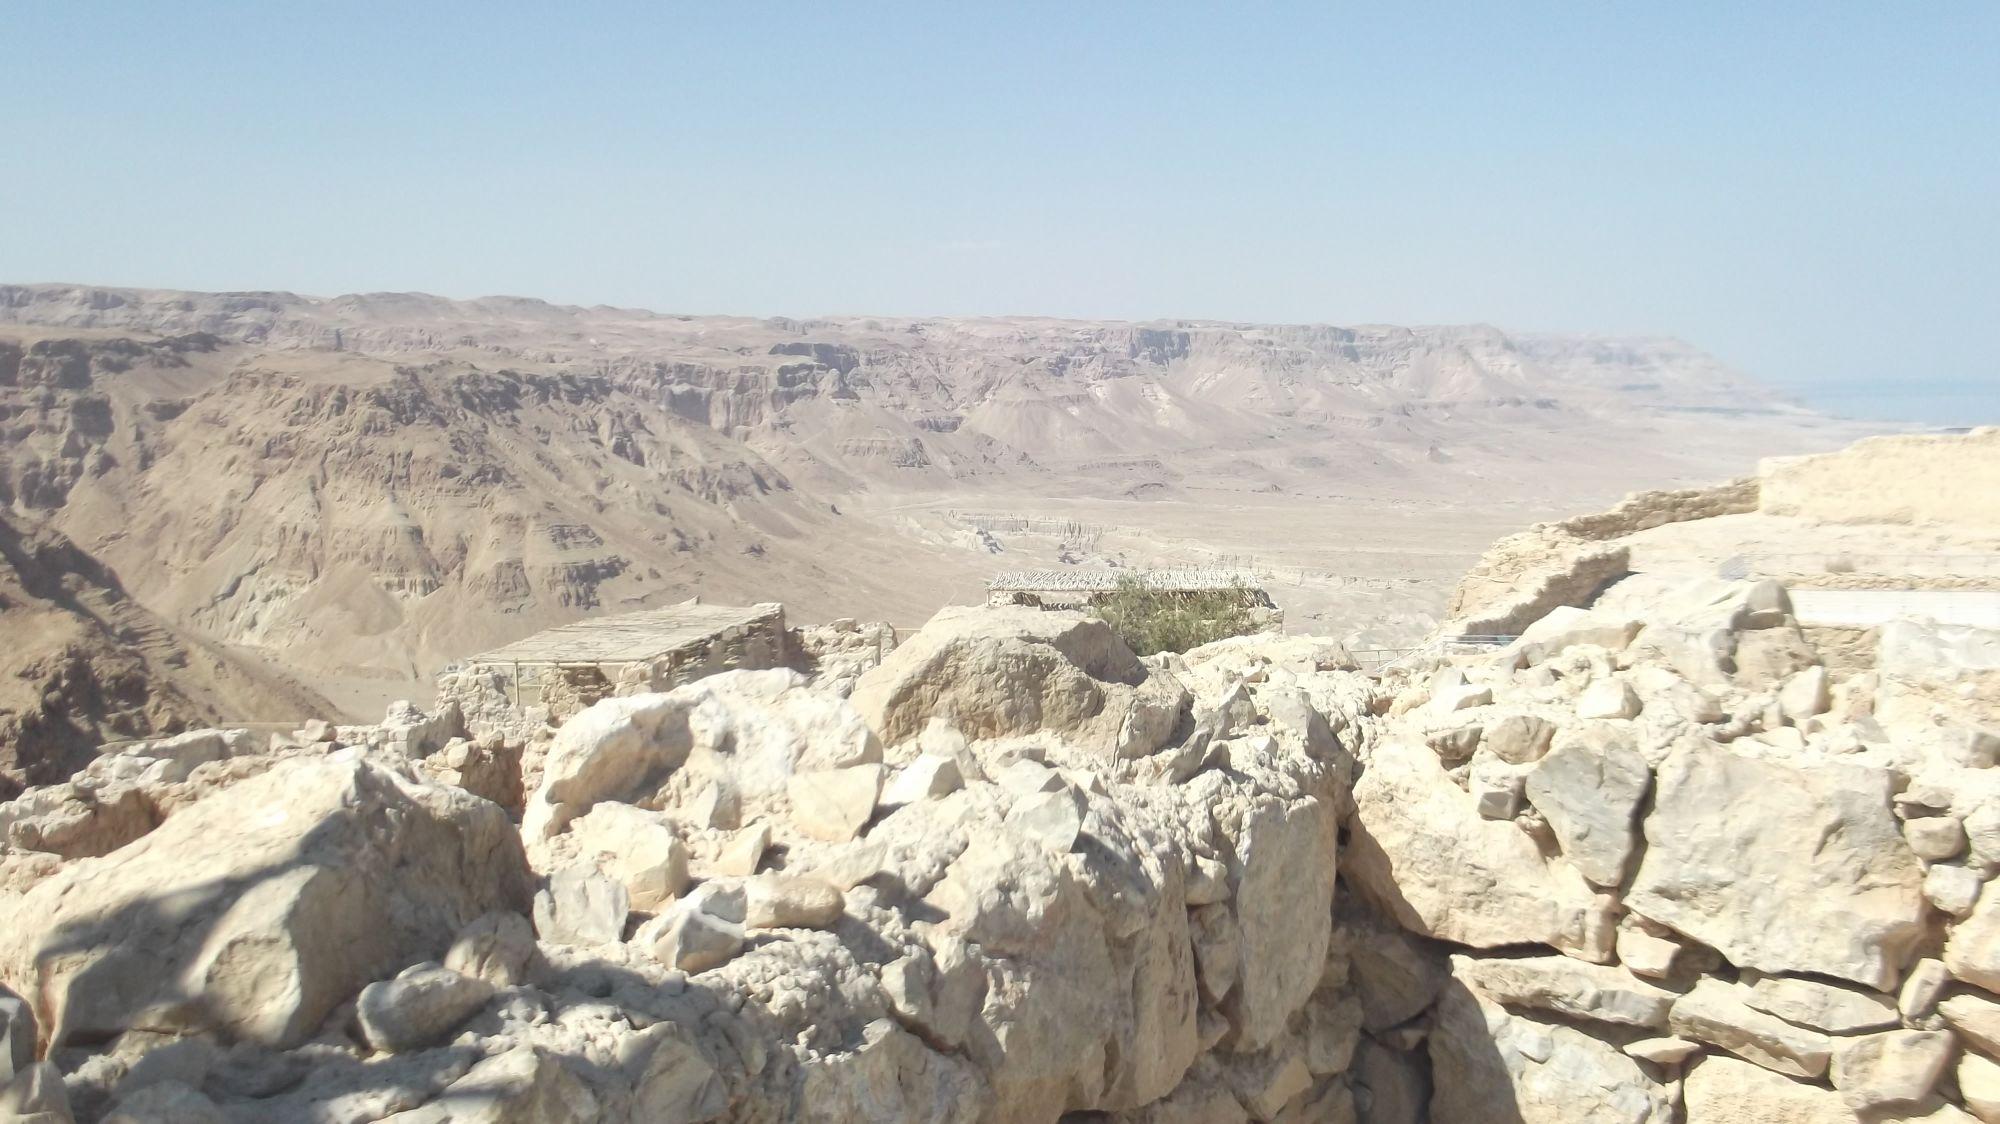 Izrael - Masada - zdjęcia, atrakcje